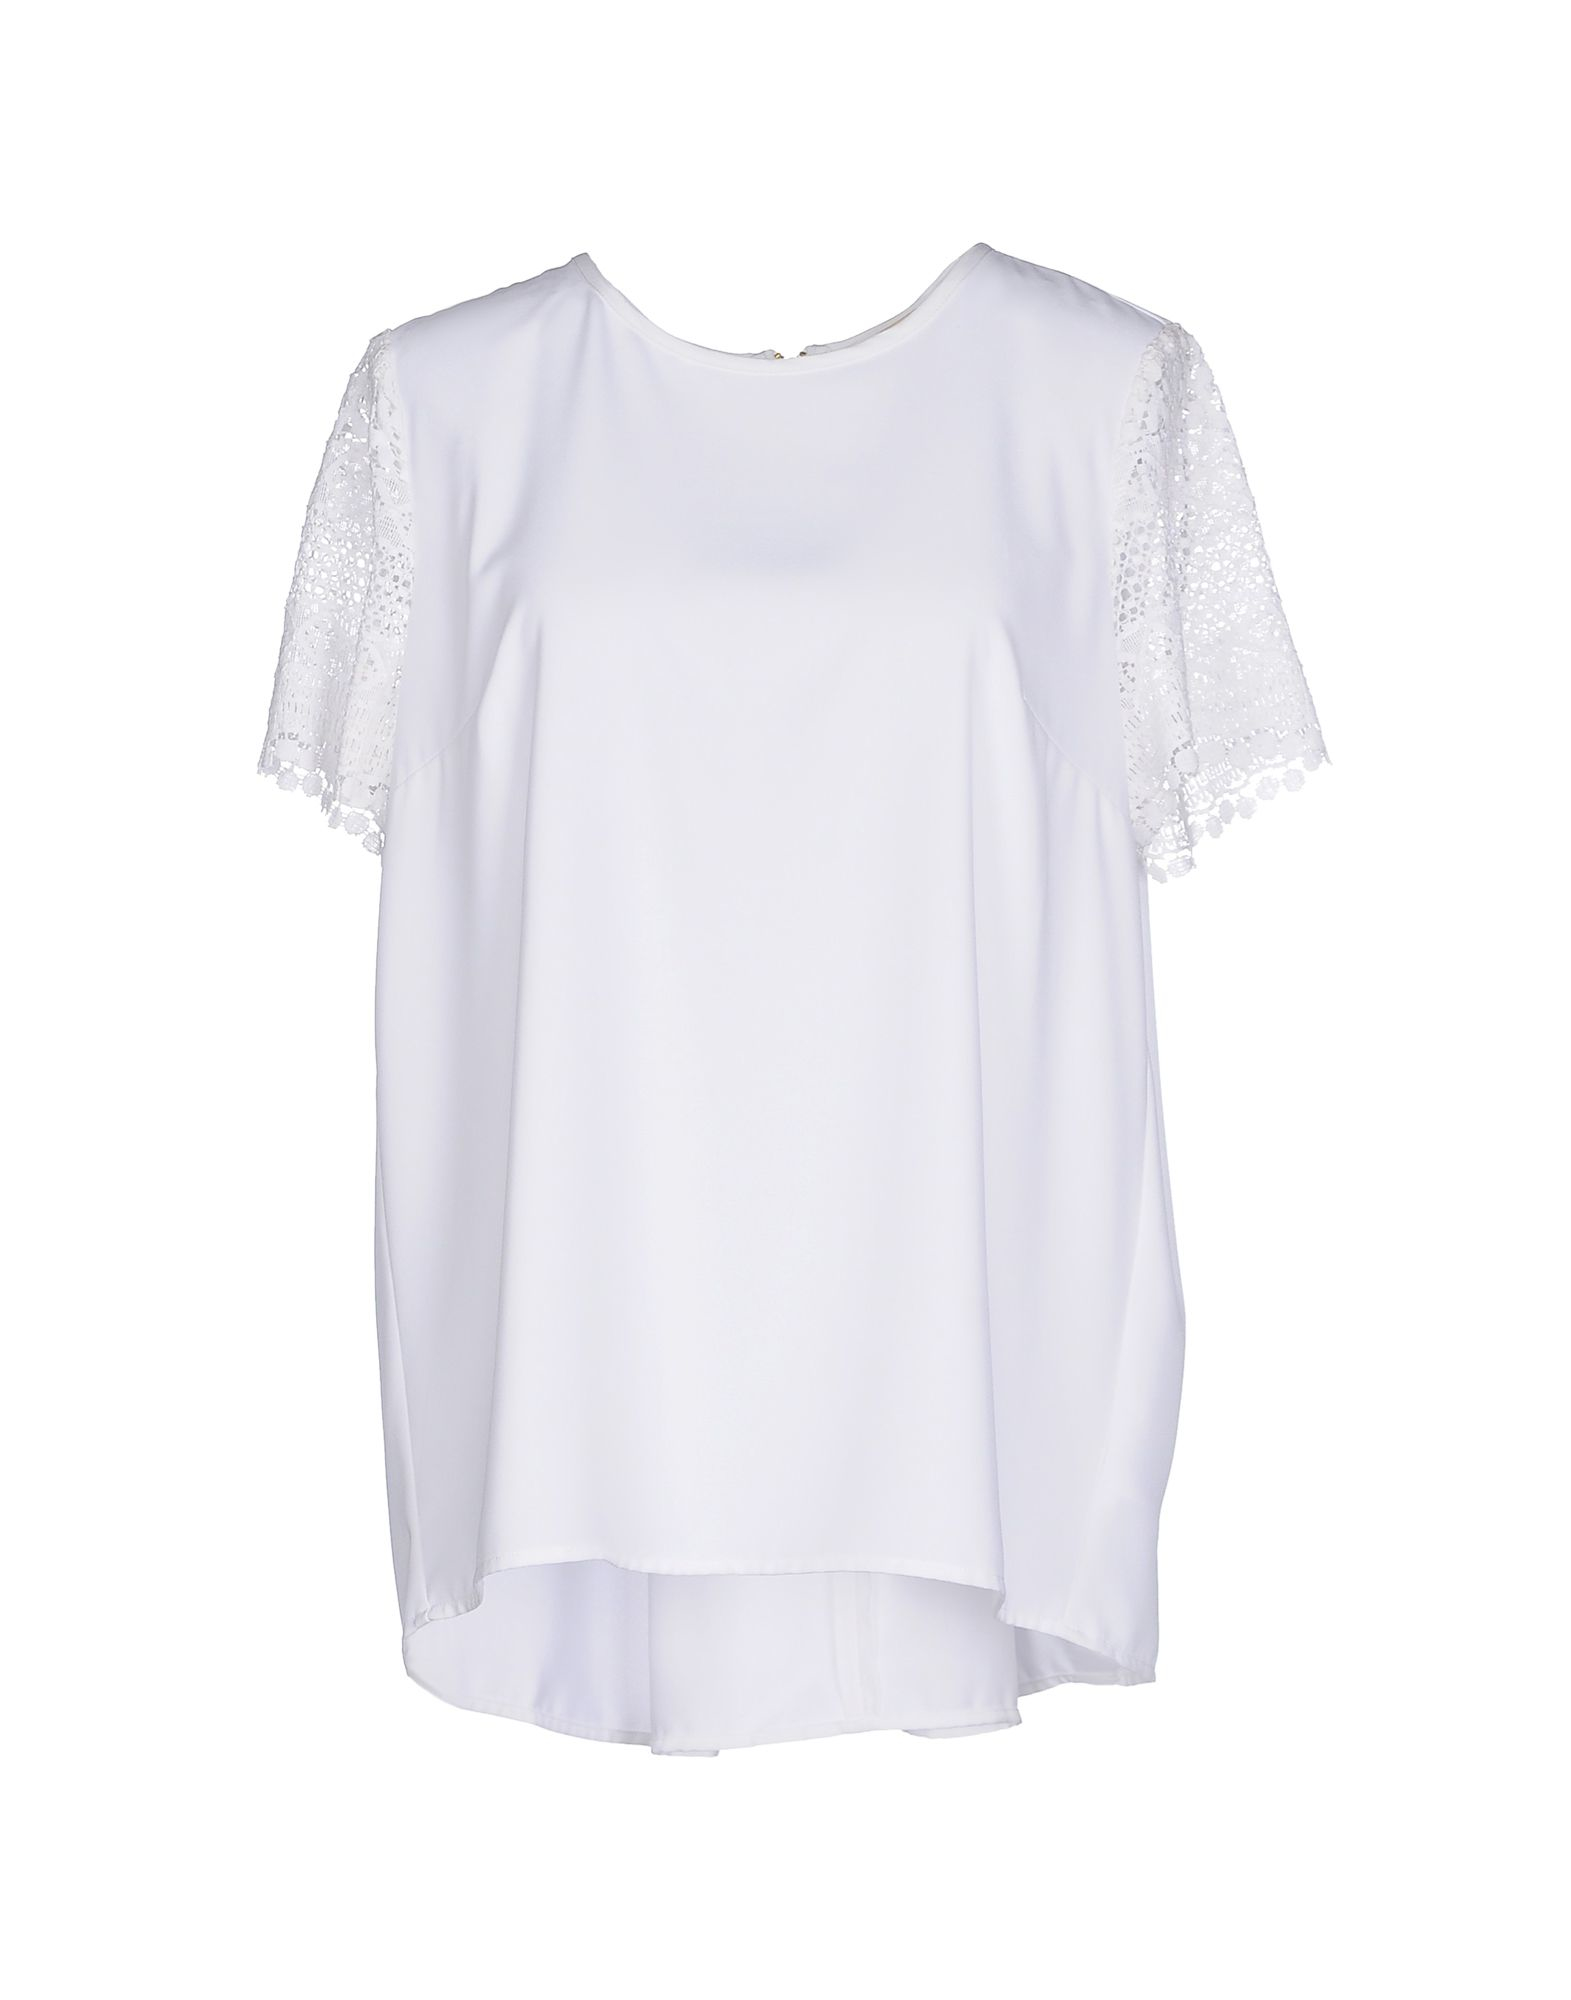 michael michael kors blouse in white lyst. Black Bedroom Furniture Sets. Home Design Ideas